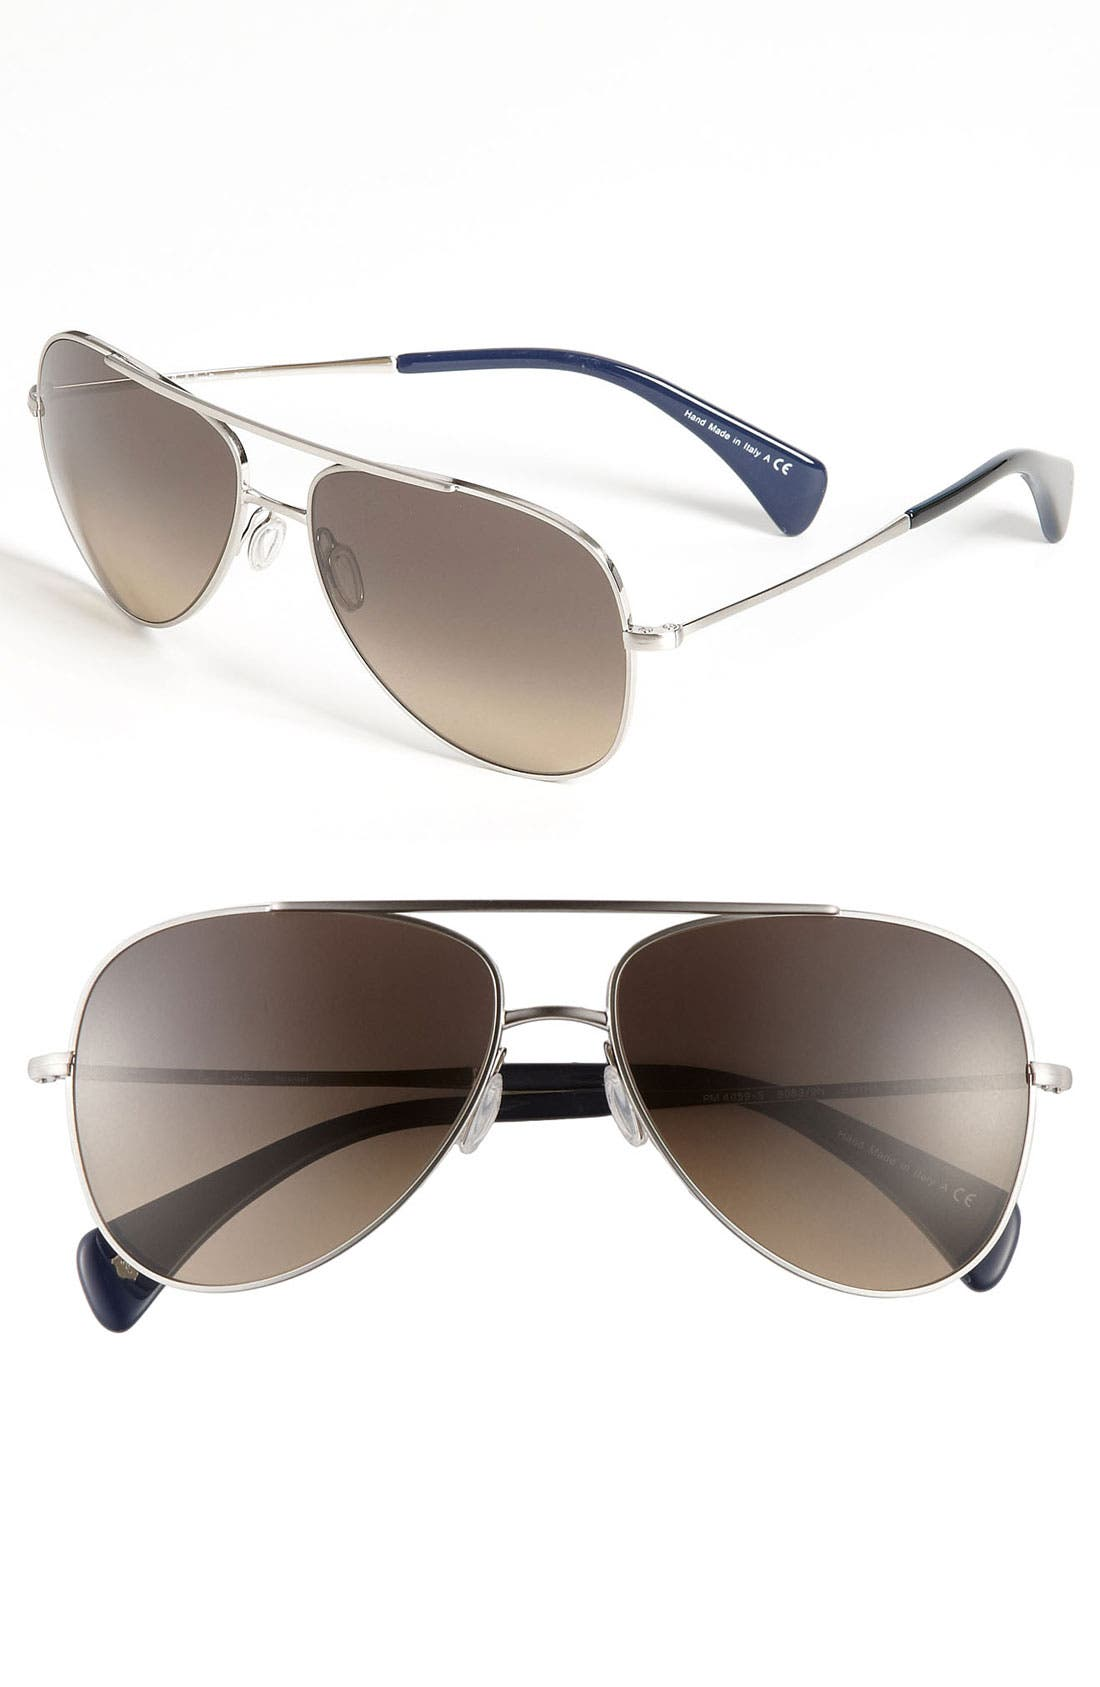 Main Image - Paul Smith 'Barrick' Polarized Aviator Sunglasses